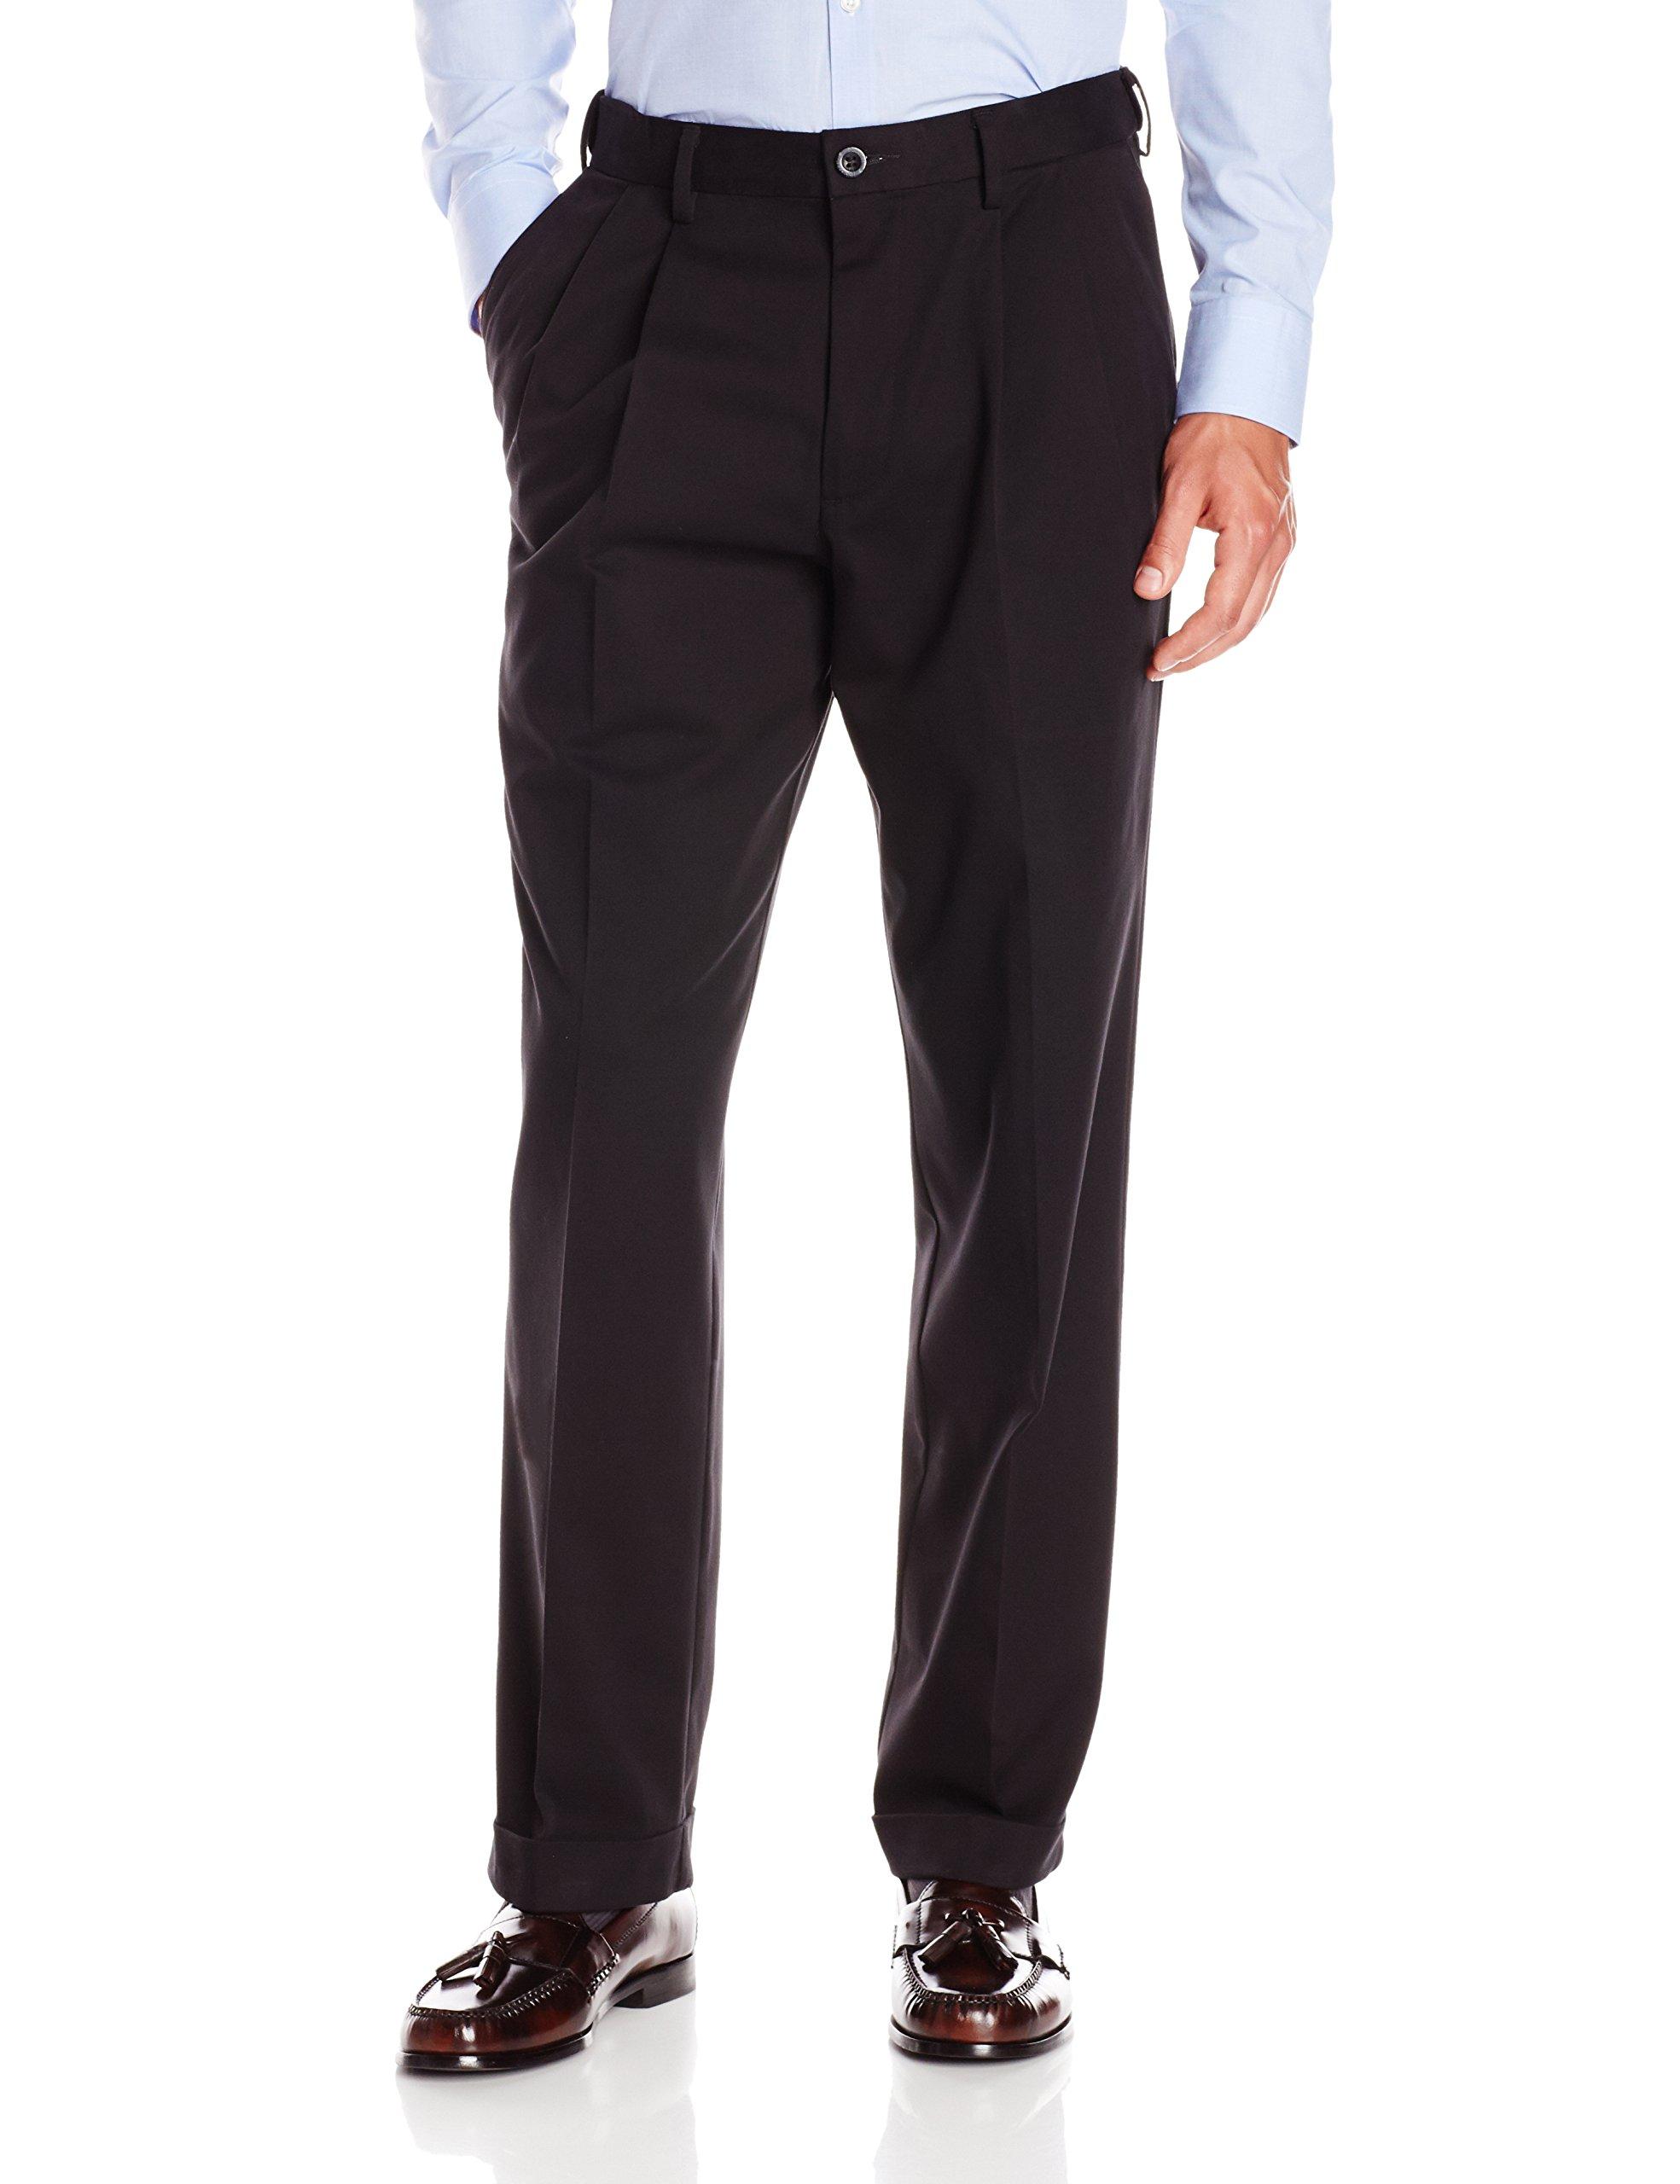 Dockers Men's Comfort Khaki Stretch Relaxed-Fit Pant, Black Metal (Stretch), 42W x 30L